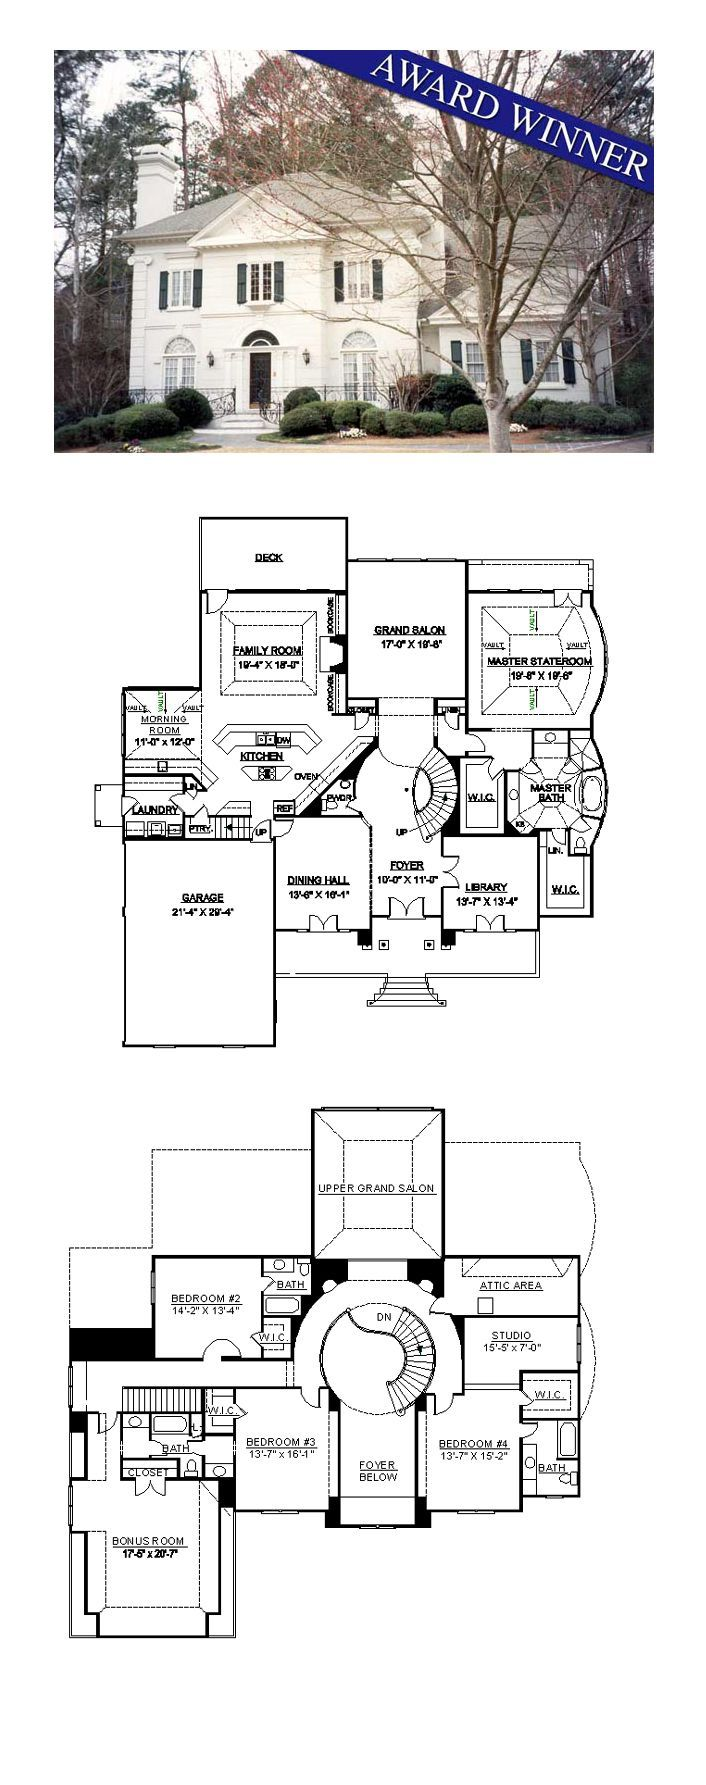 Best 25 suburban house ideas on pinterest for Suburban house floor plan